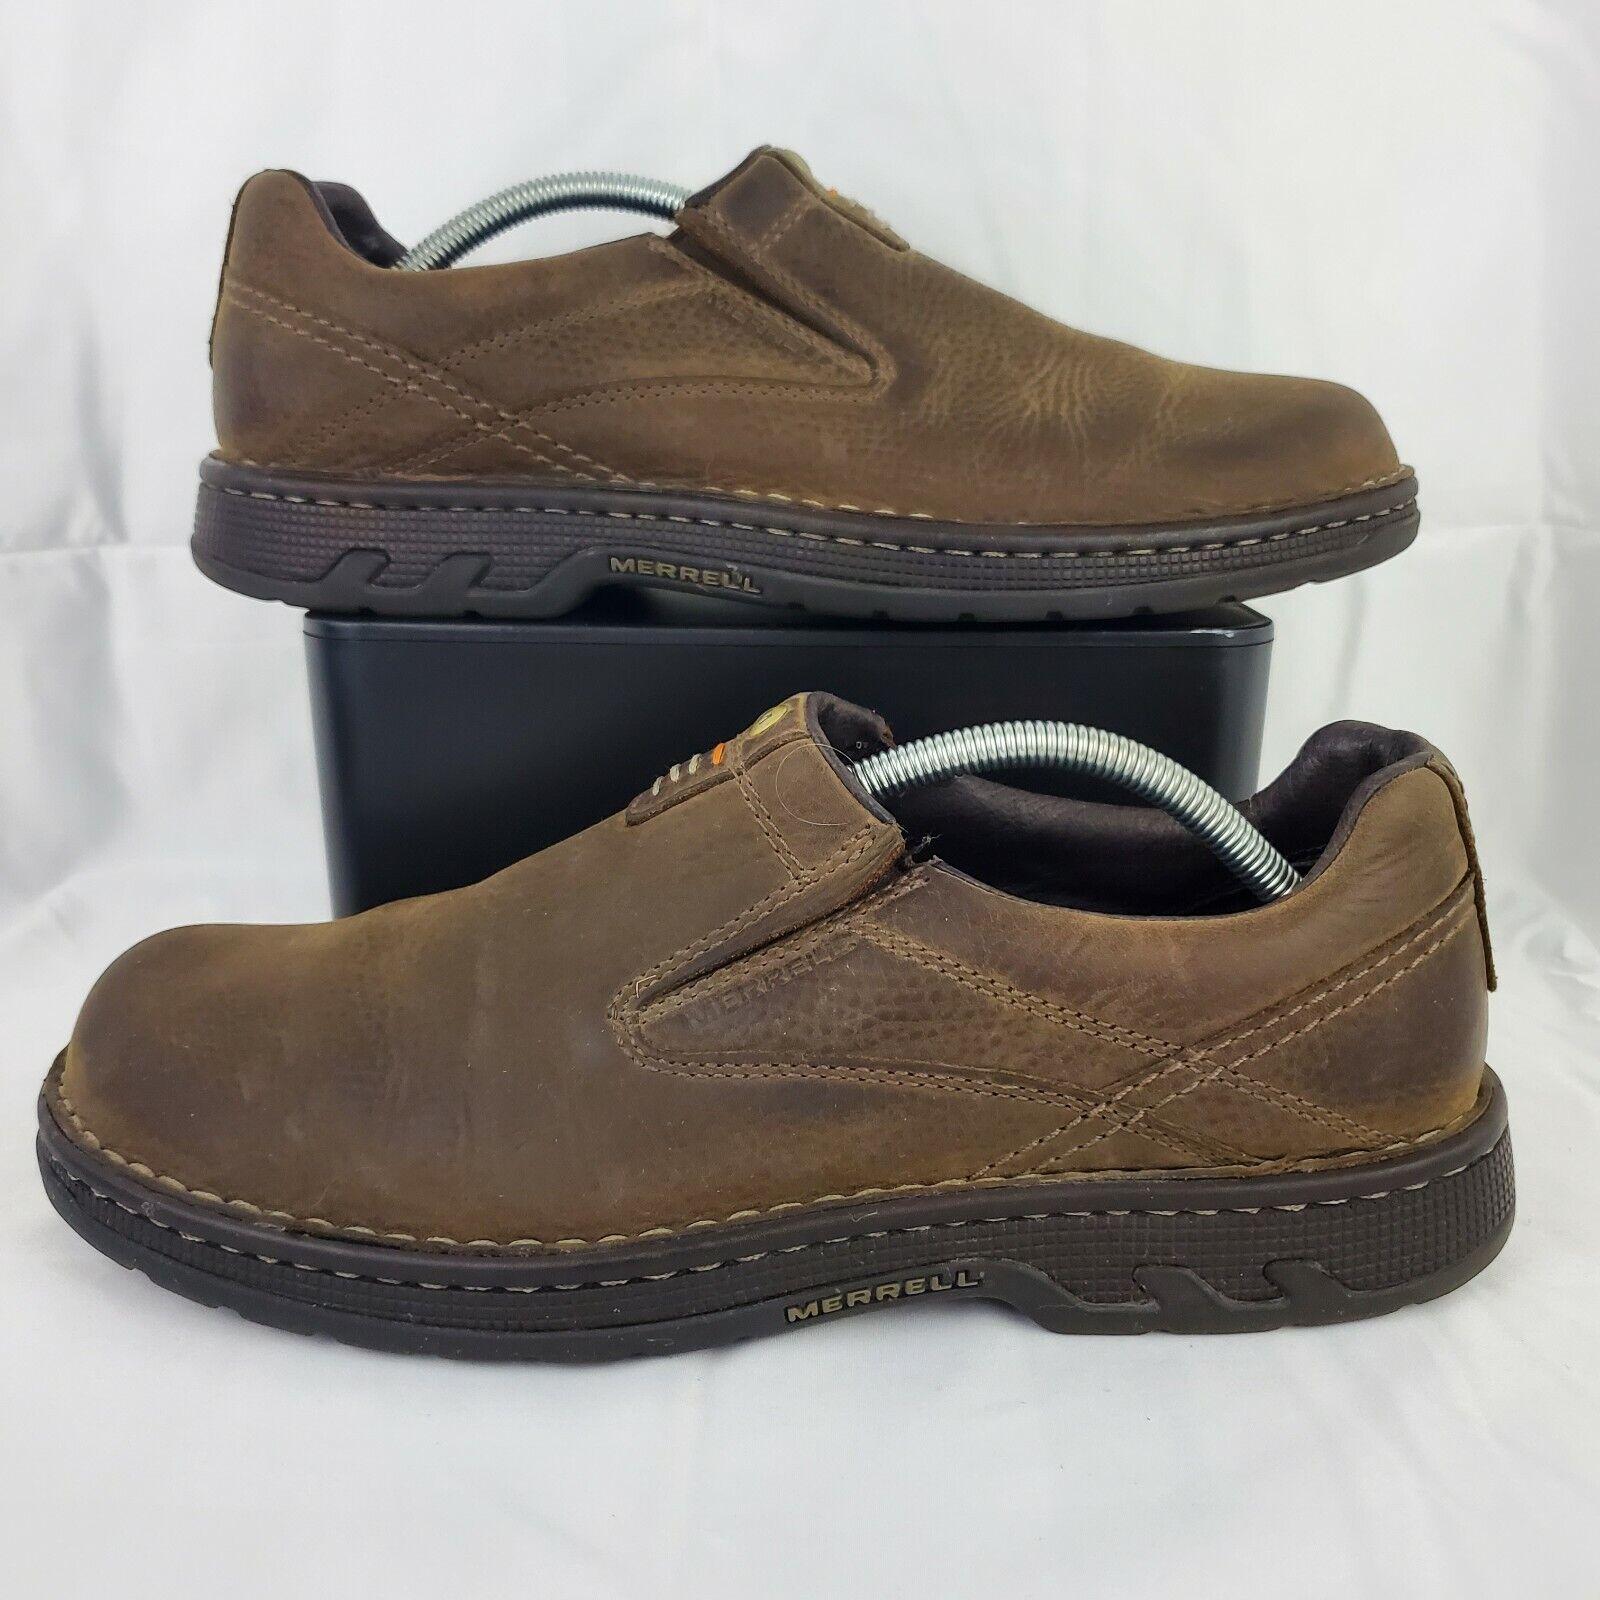 Merrell Mens World Legend Dark Earth Loafer Size 11 Brown Leather Shoes J45197